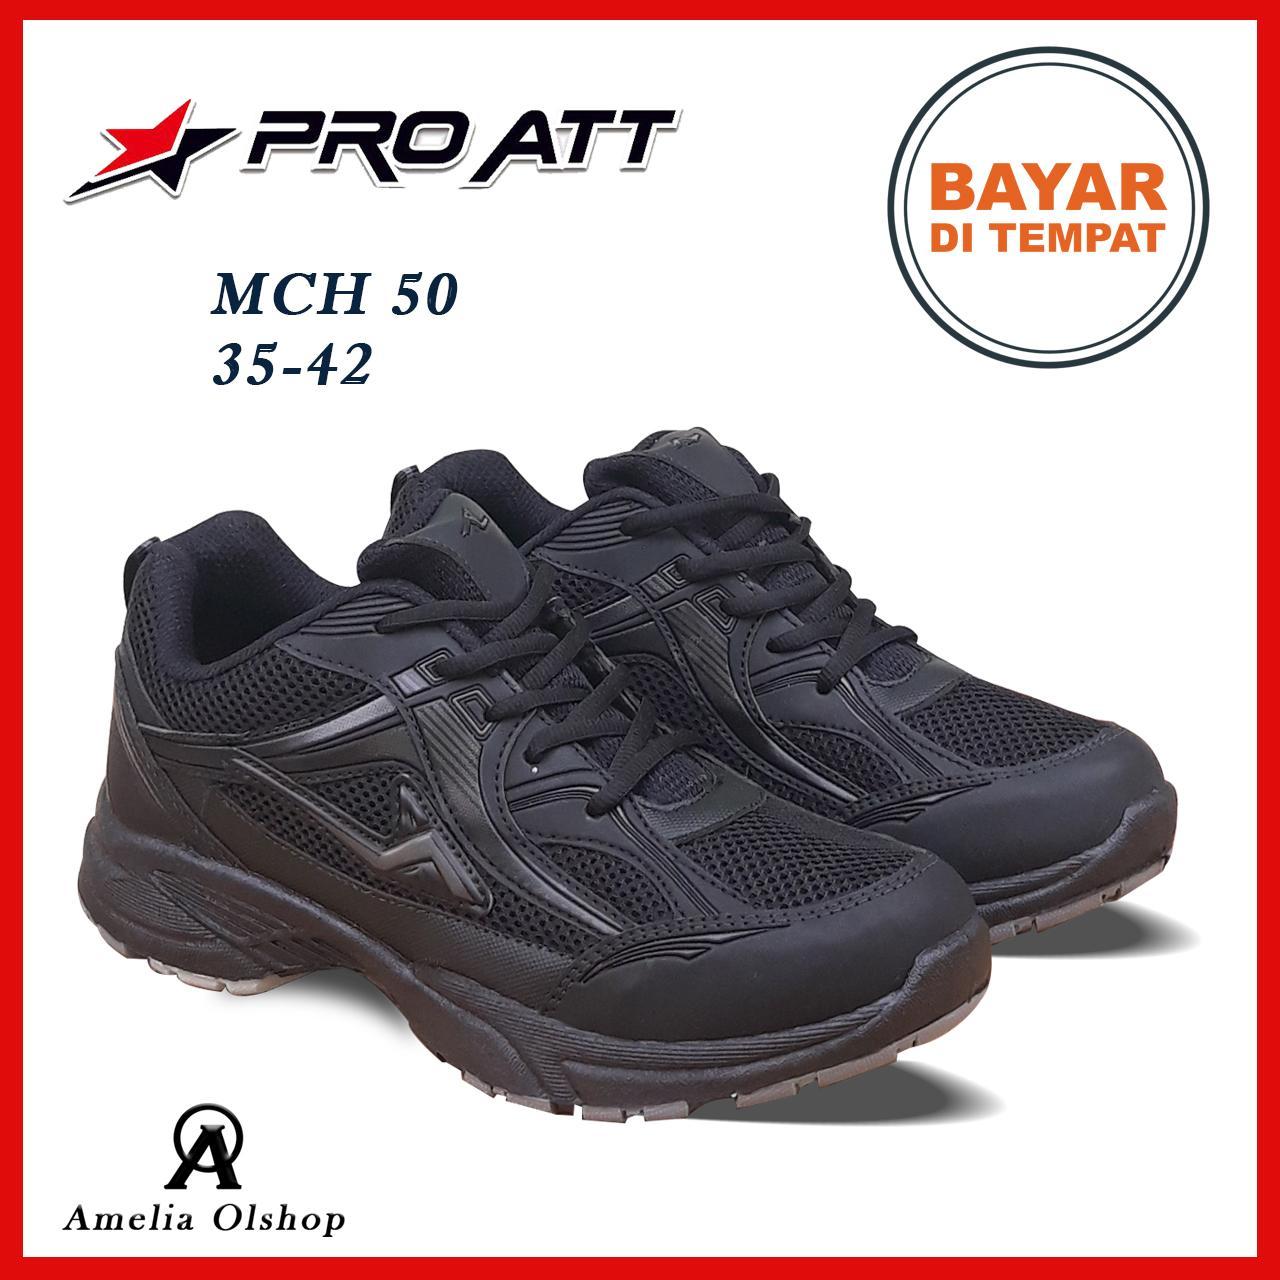 Amelia Olshop - Sepatu PRO ATT MCH 50 35-42   Sepatu Sekolah   Sepatu be10c578b9